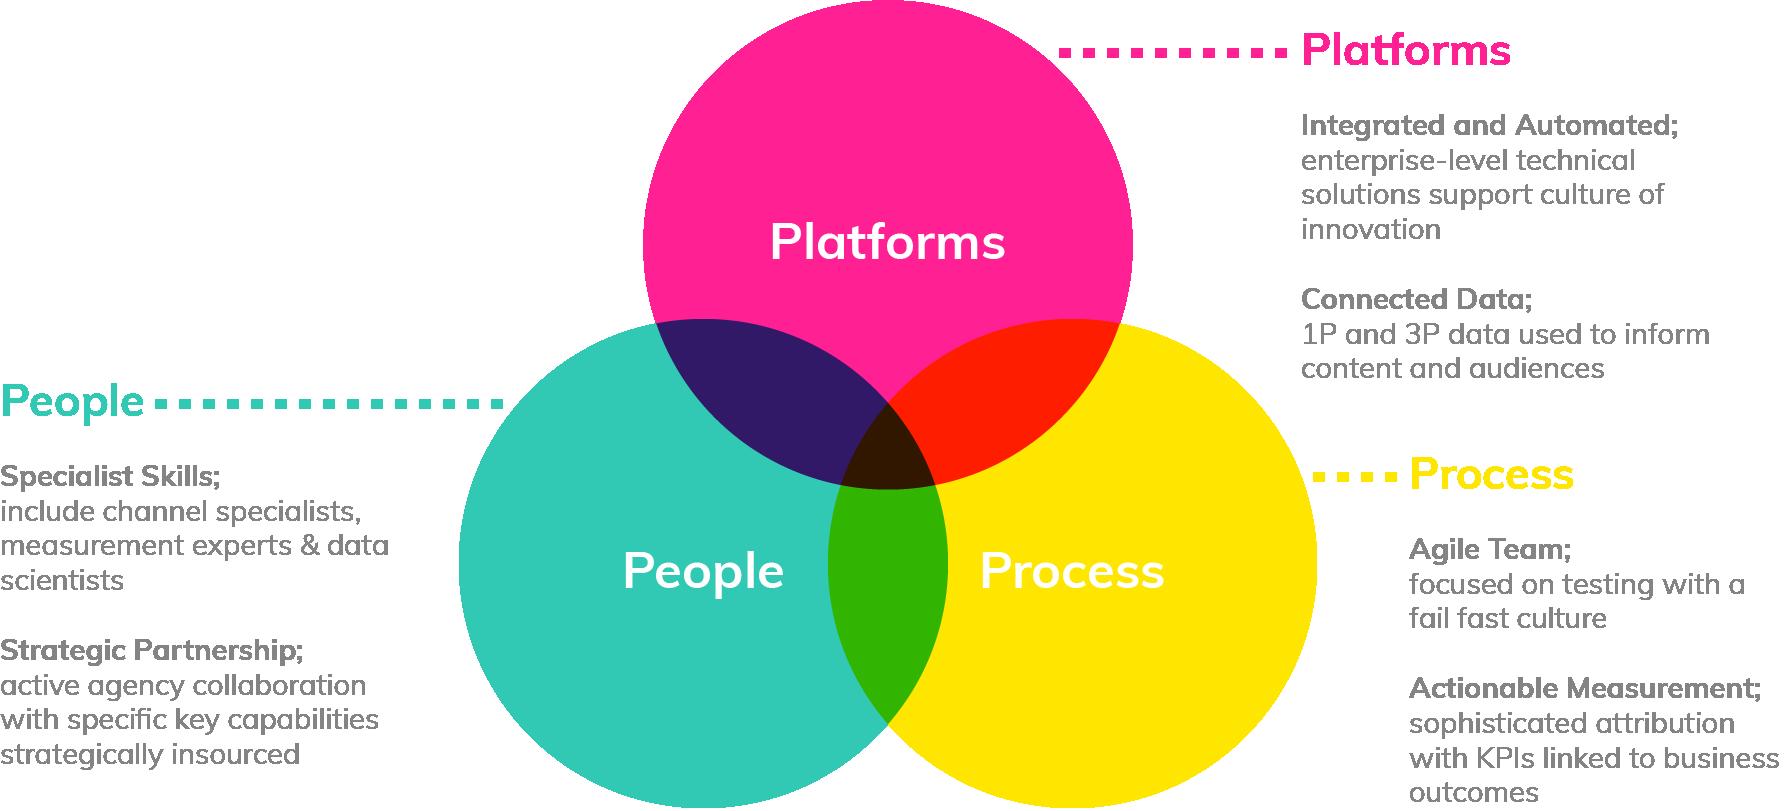 PlatformsPeopleProcess_01.png